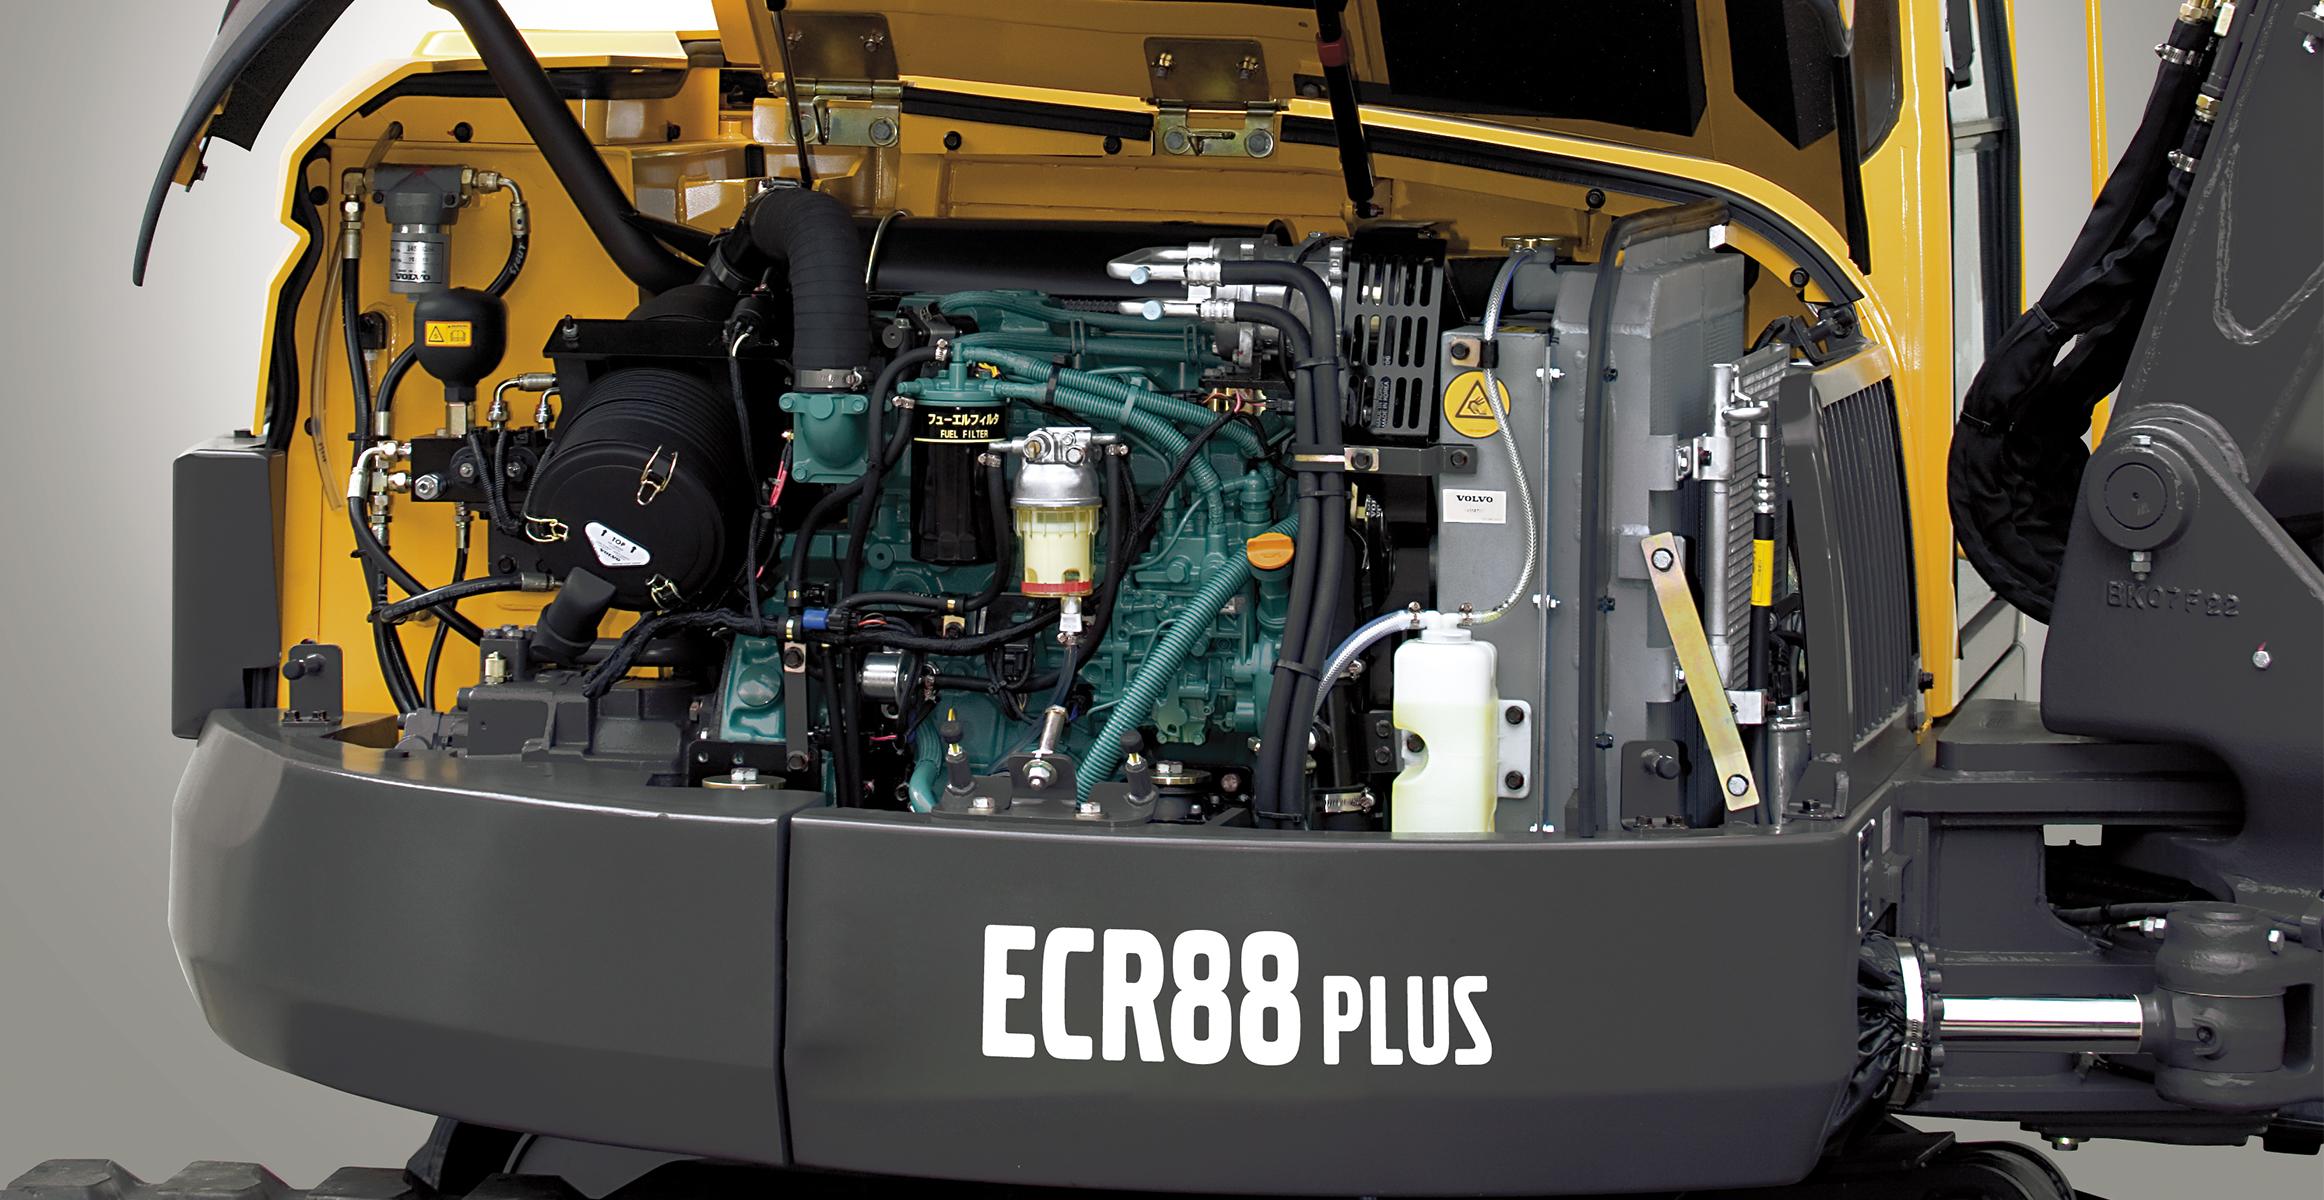 ECR88 Plus | Excavators | Overview | Volvo Construction Equipment